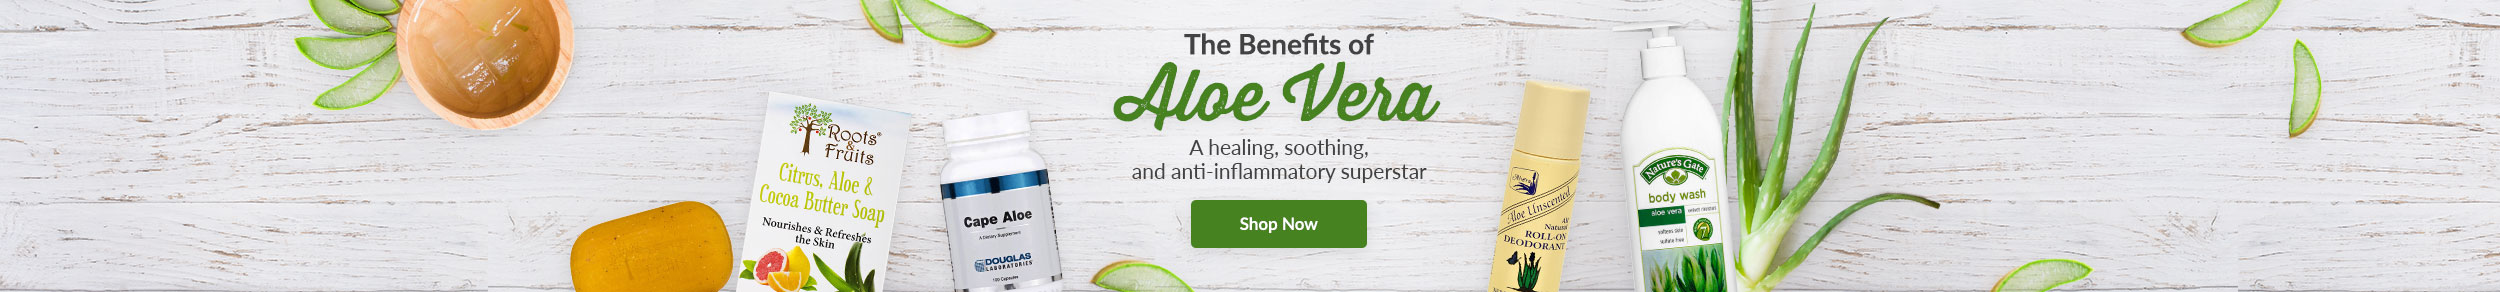 https://i3.pureformulas.net/images/static/Generic-benefits-Aloe-Vera_Beauty-3_091918.jpg